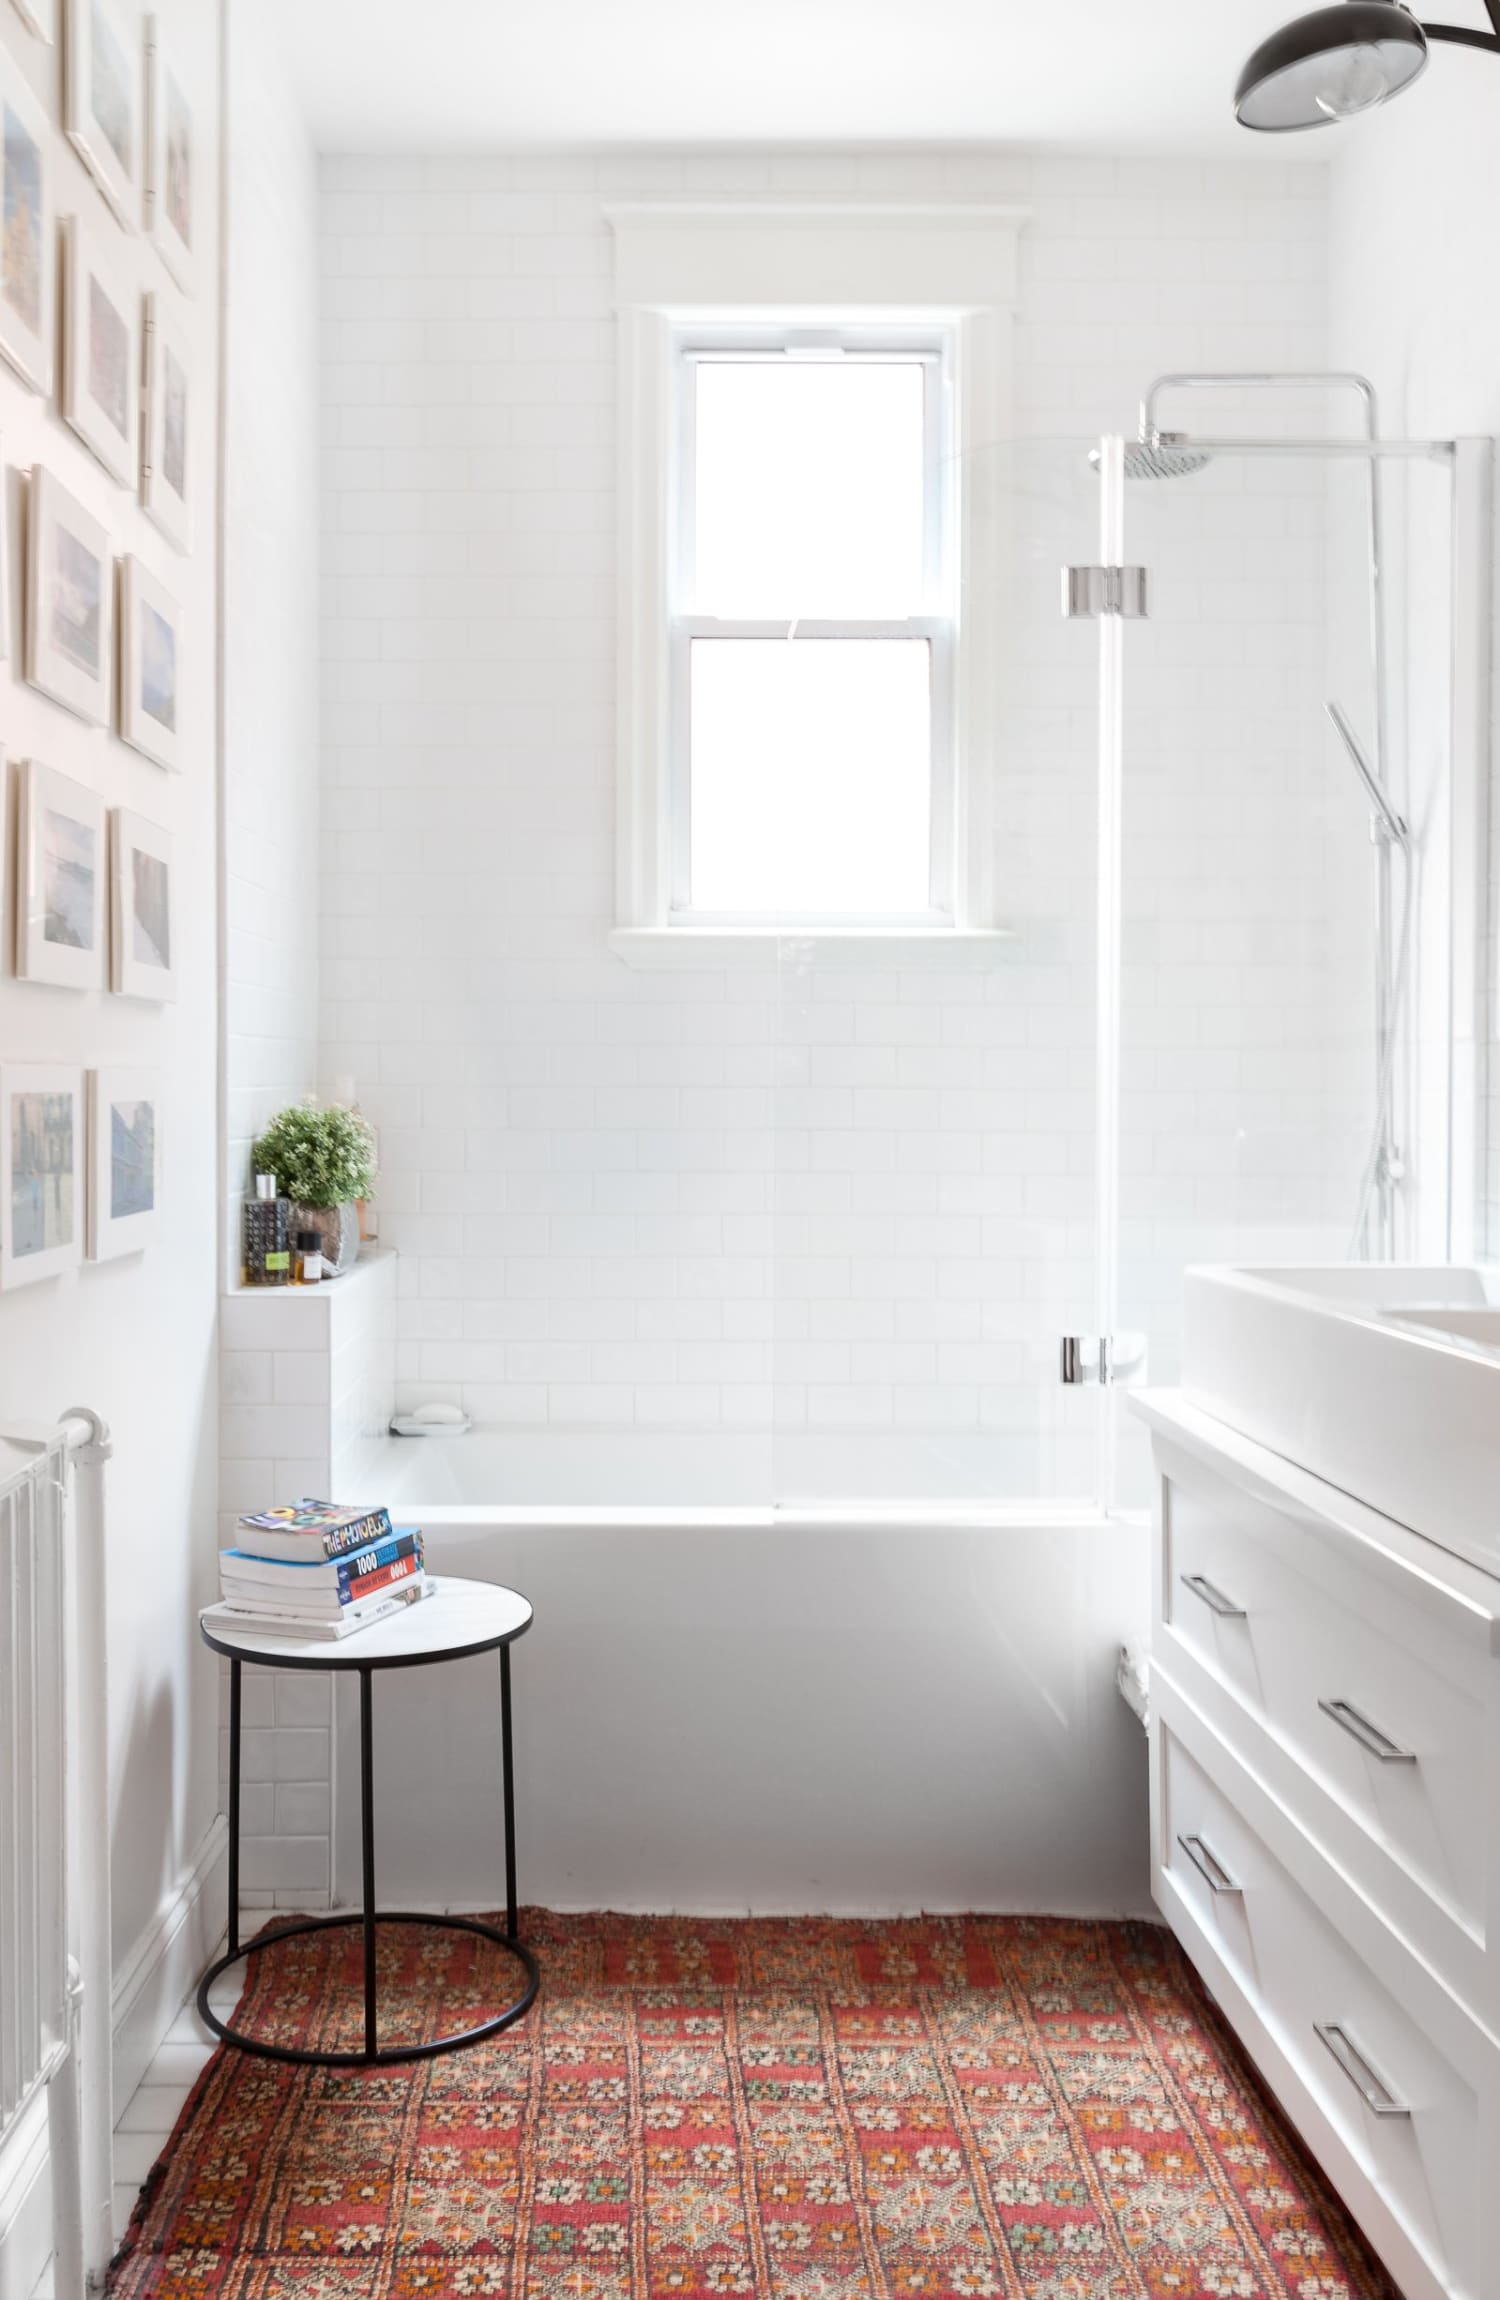 Small Bathroom Design Ideas - 7 Beautiful Remodels ... on Small Apartment Bathroom  id=26155